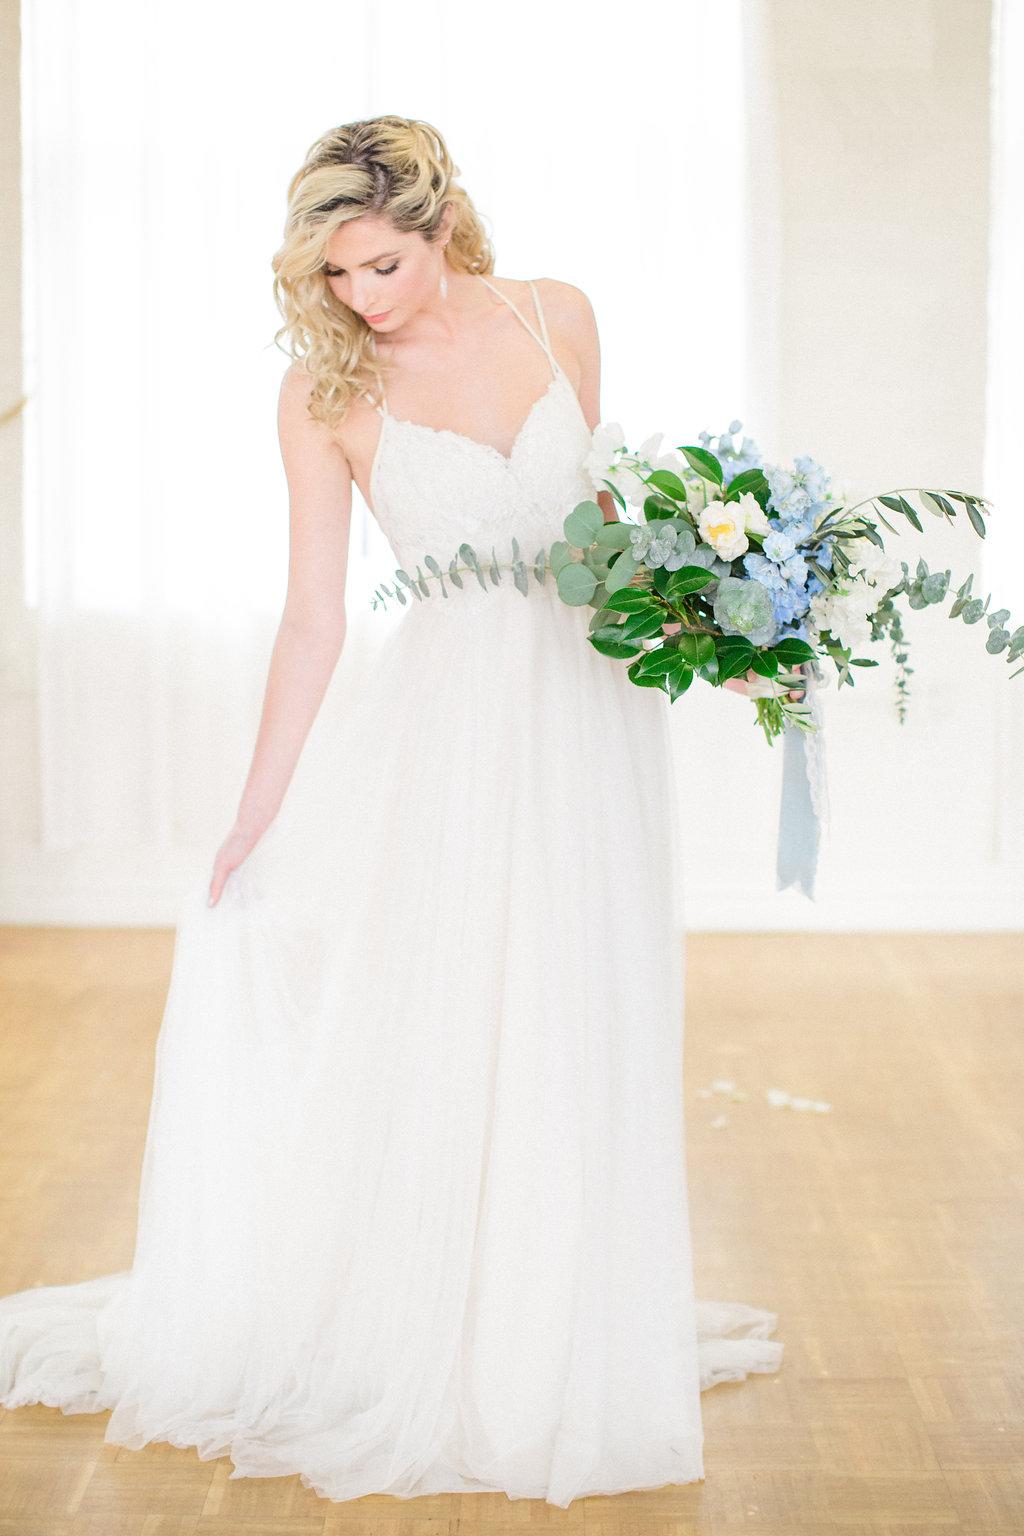 Styled photoshoot something gold something blue les for Shannon farren wedding